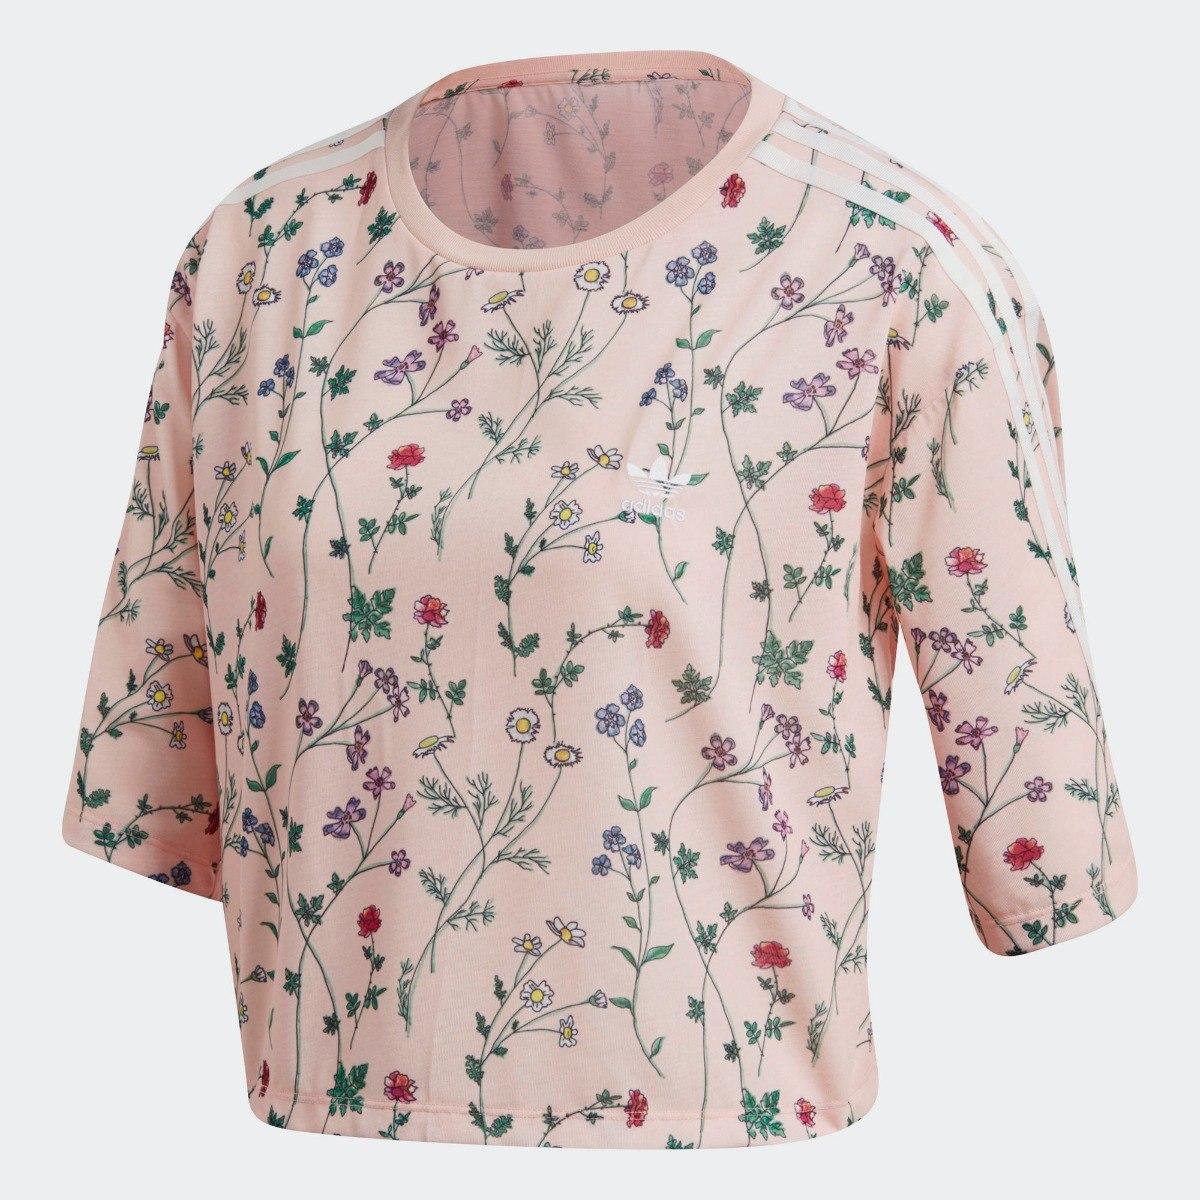 ff660559aeb camiseta feminina adidas printed original - footlet. Carregando zoom.